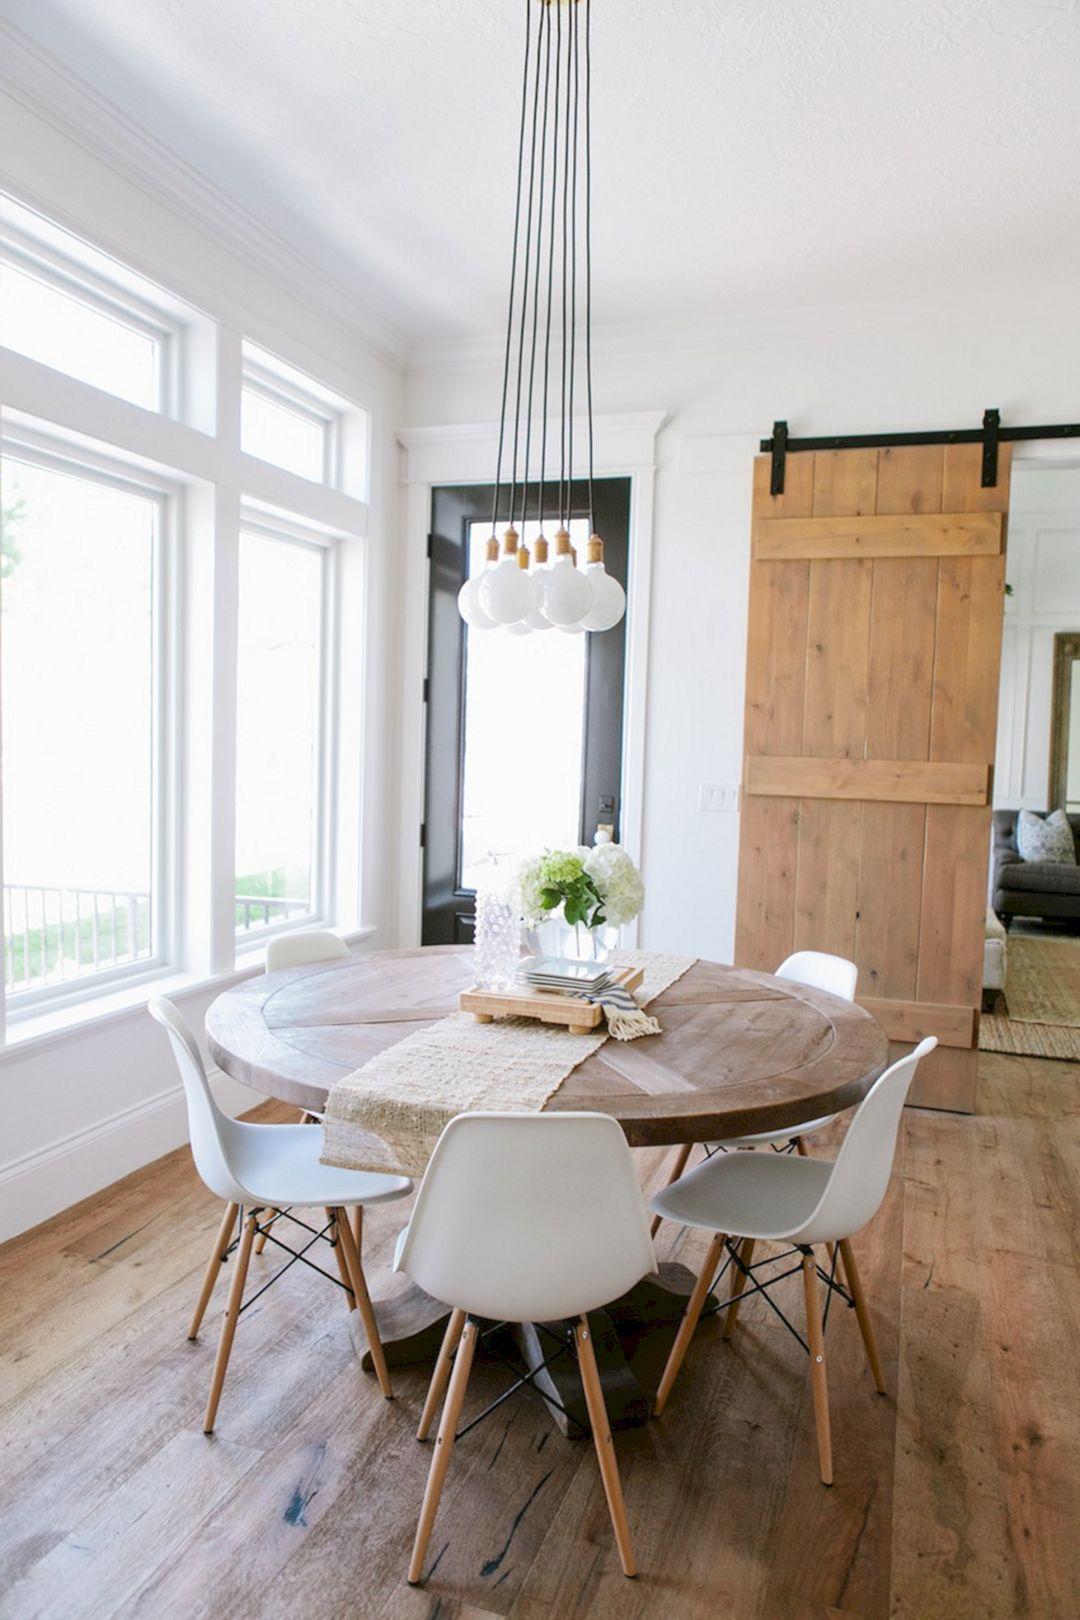 75 Simple And Minimalist Dining Table Decor Ideas Apartment